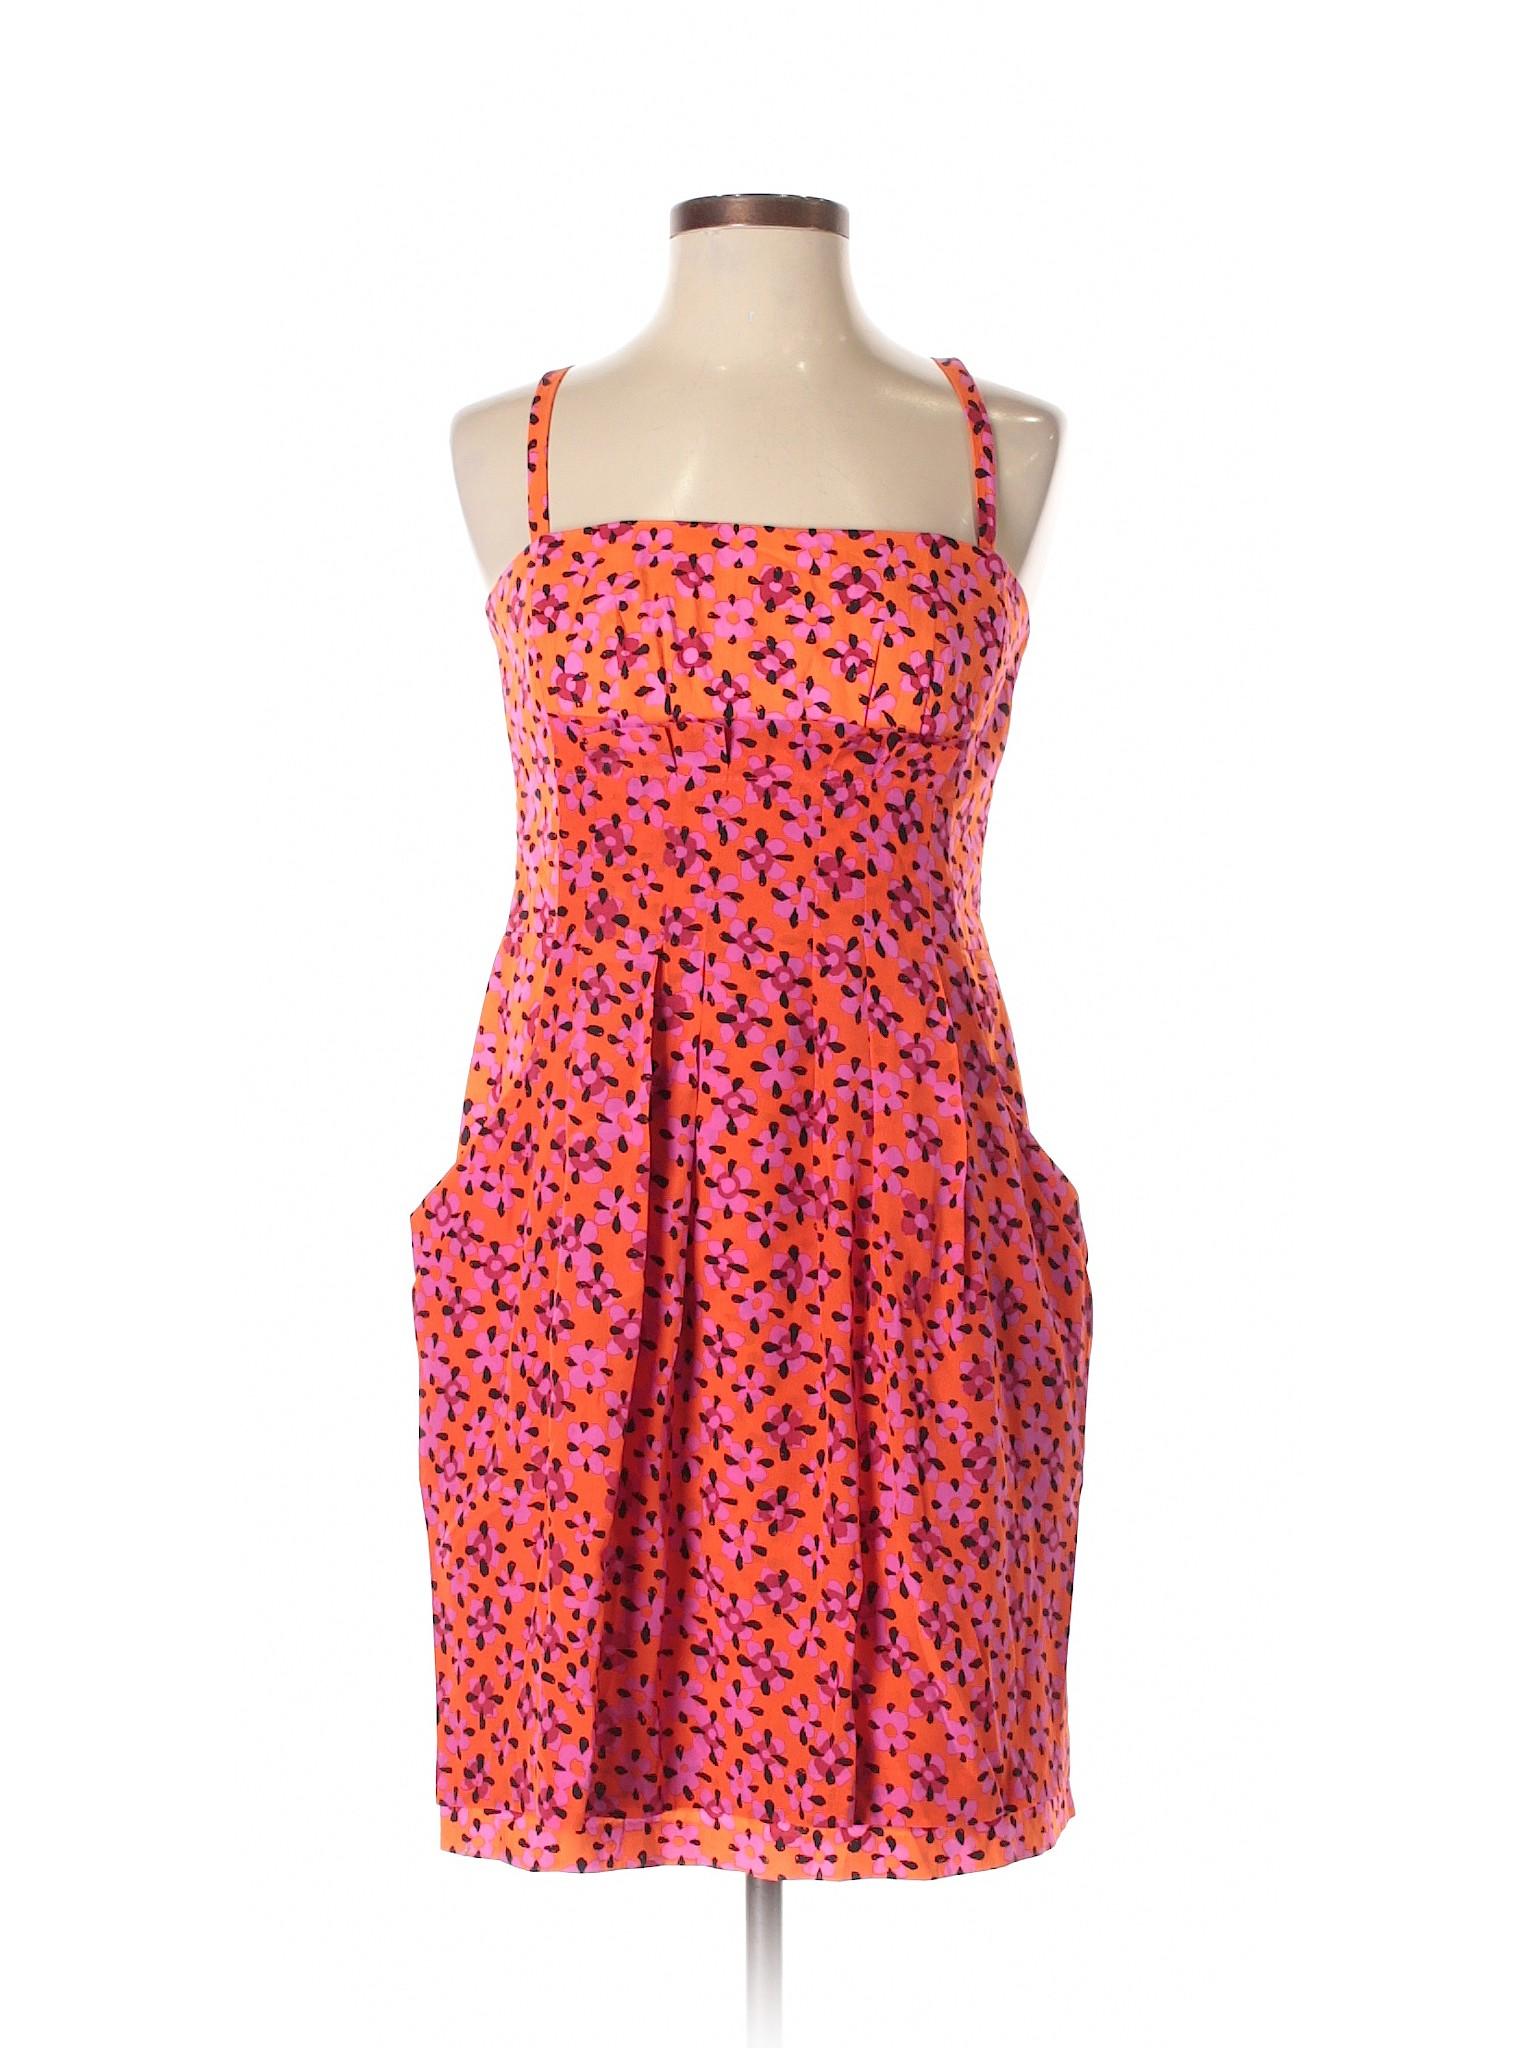 Lepore Dress Boutique Casual winter Nanette qEHTHBwA8